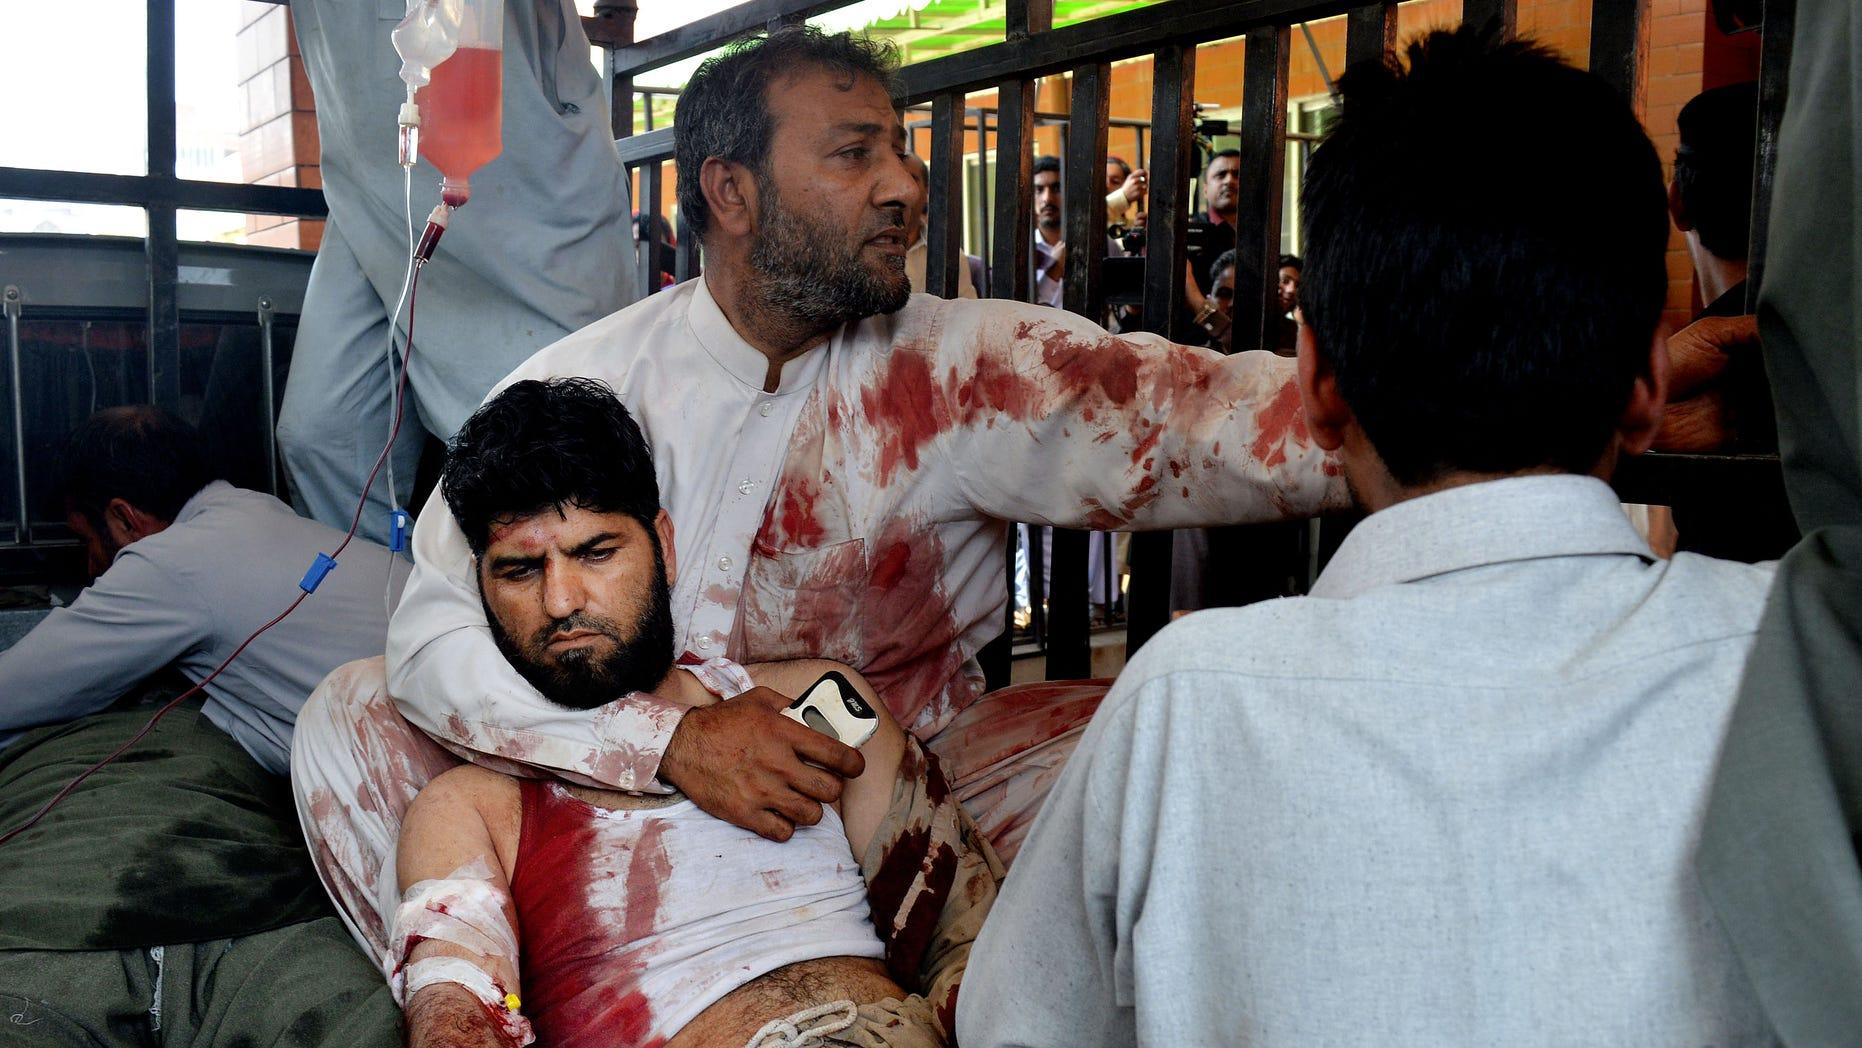 Volunteers carry an injured man to a hospital in Peshawar, Pakistan.